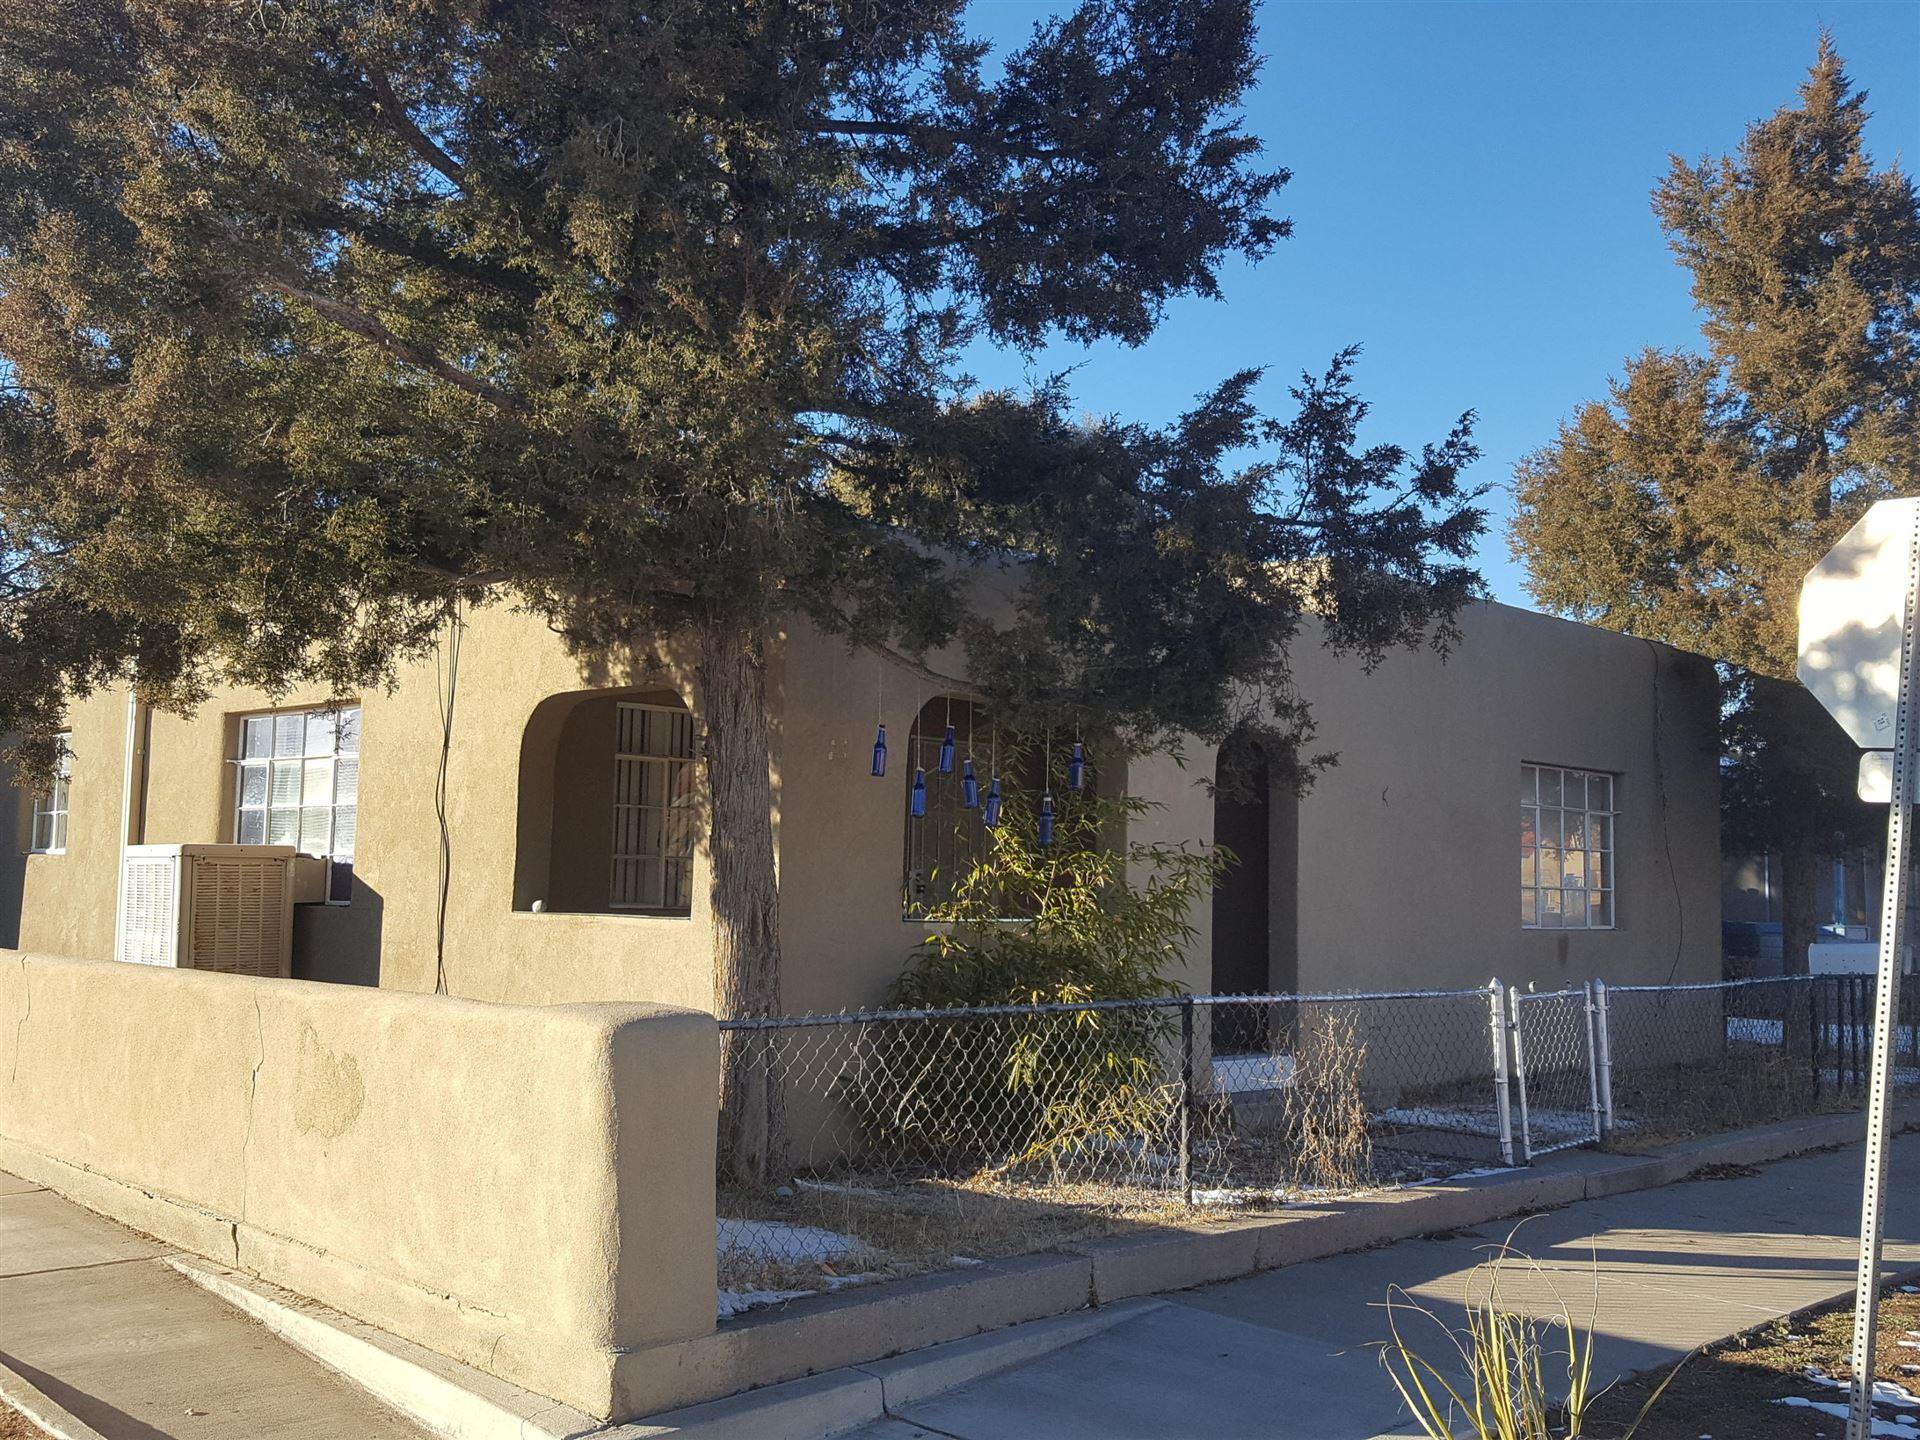 1301 7TH Street NW, Albuquerque, NM 87102 - #: 1000139